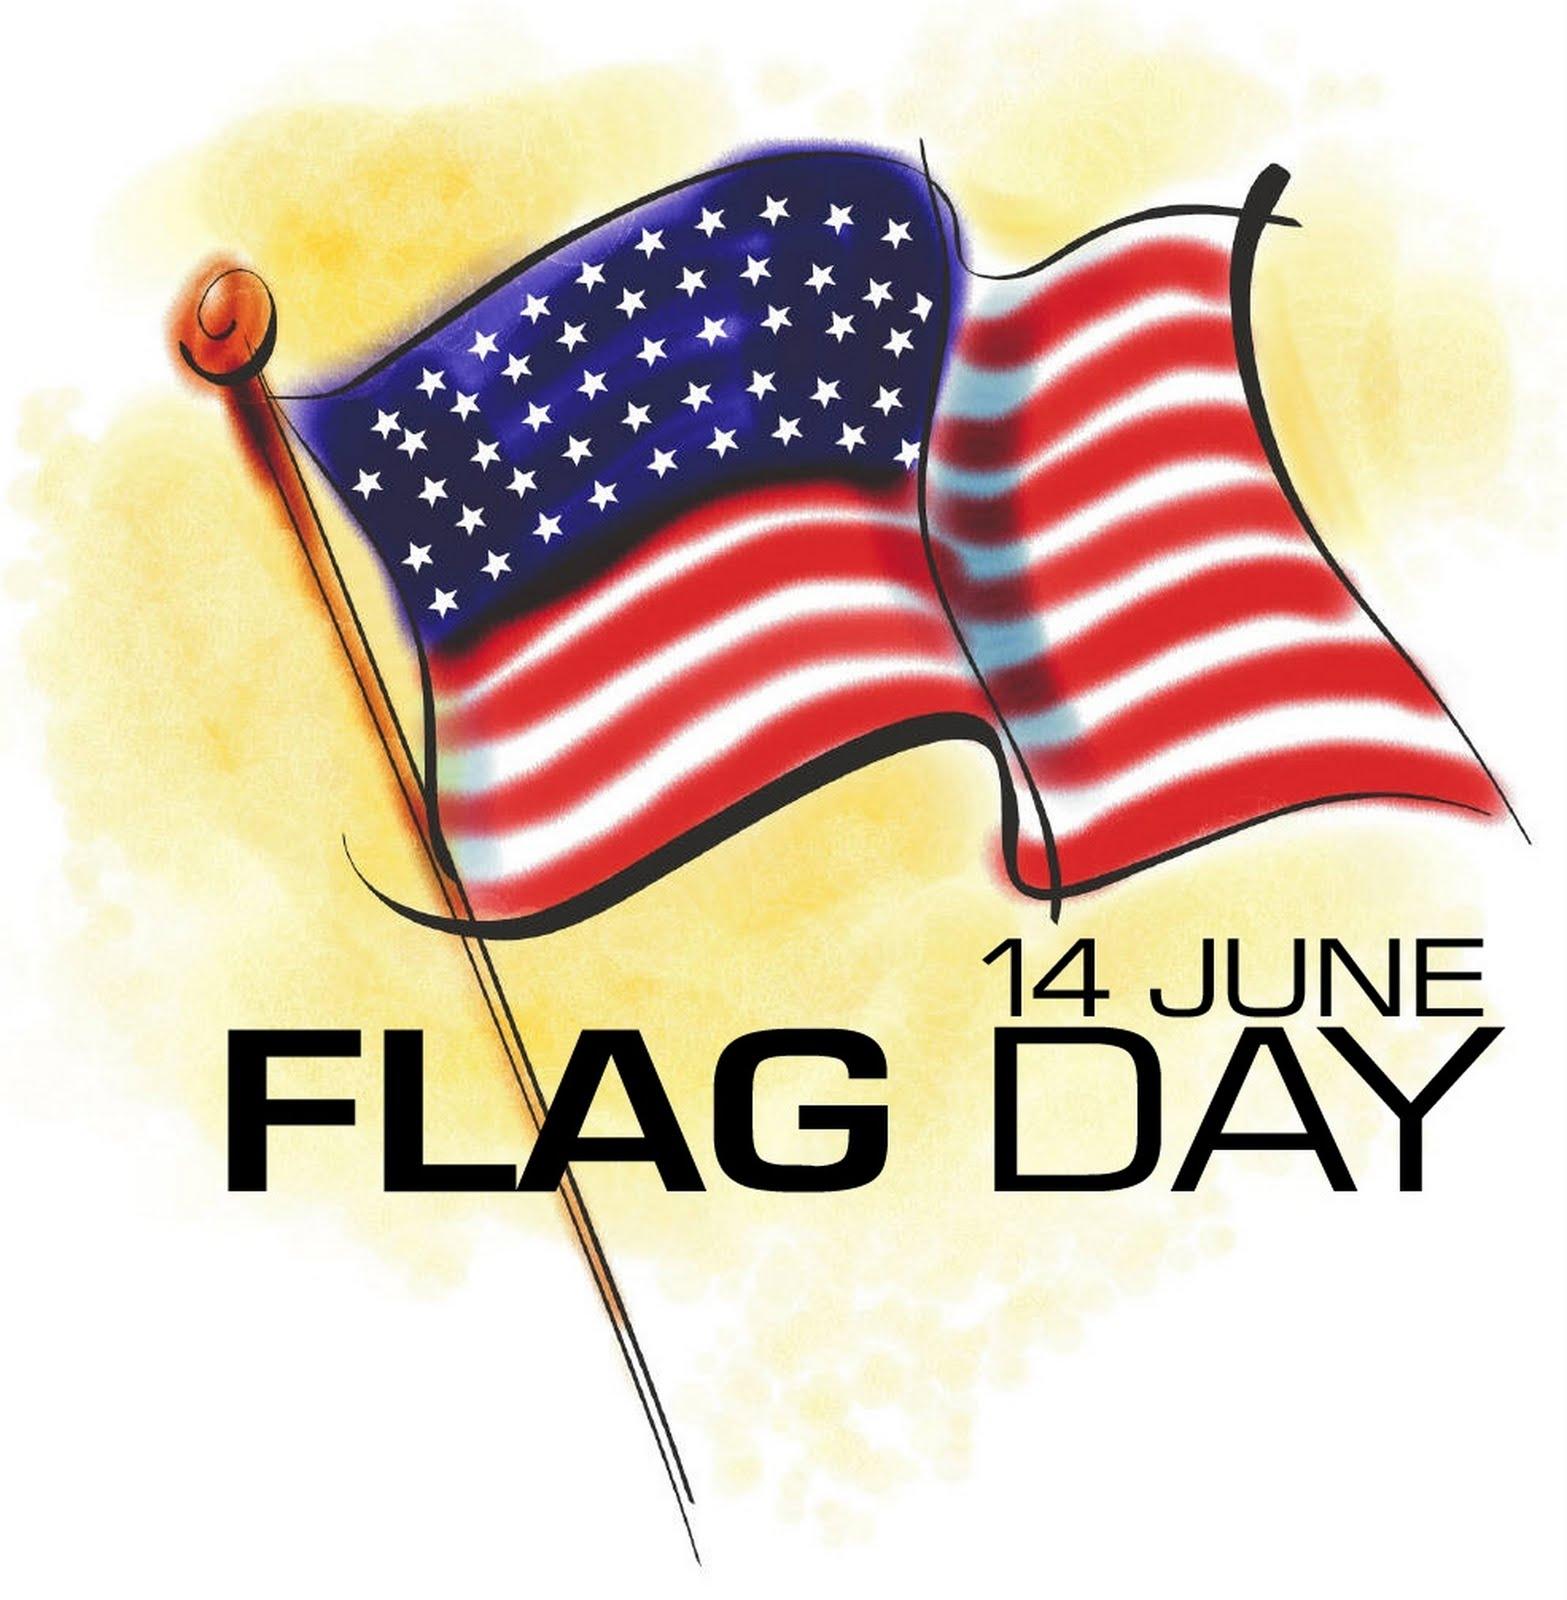 flag_day_color.jpg